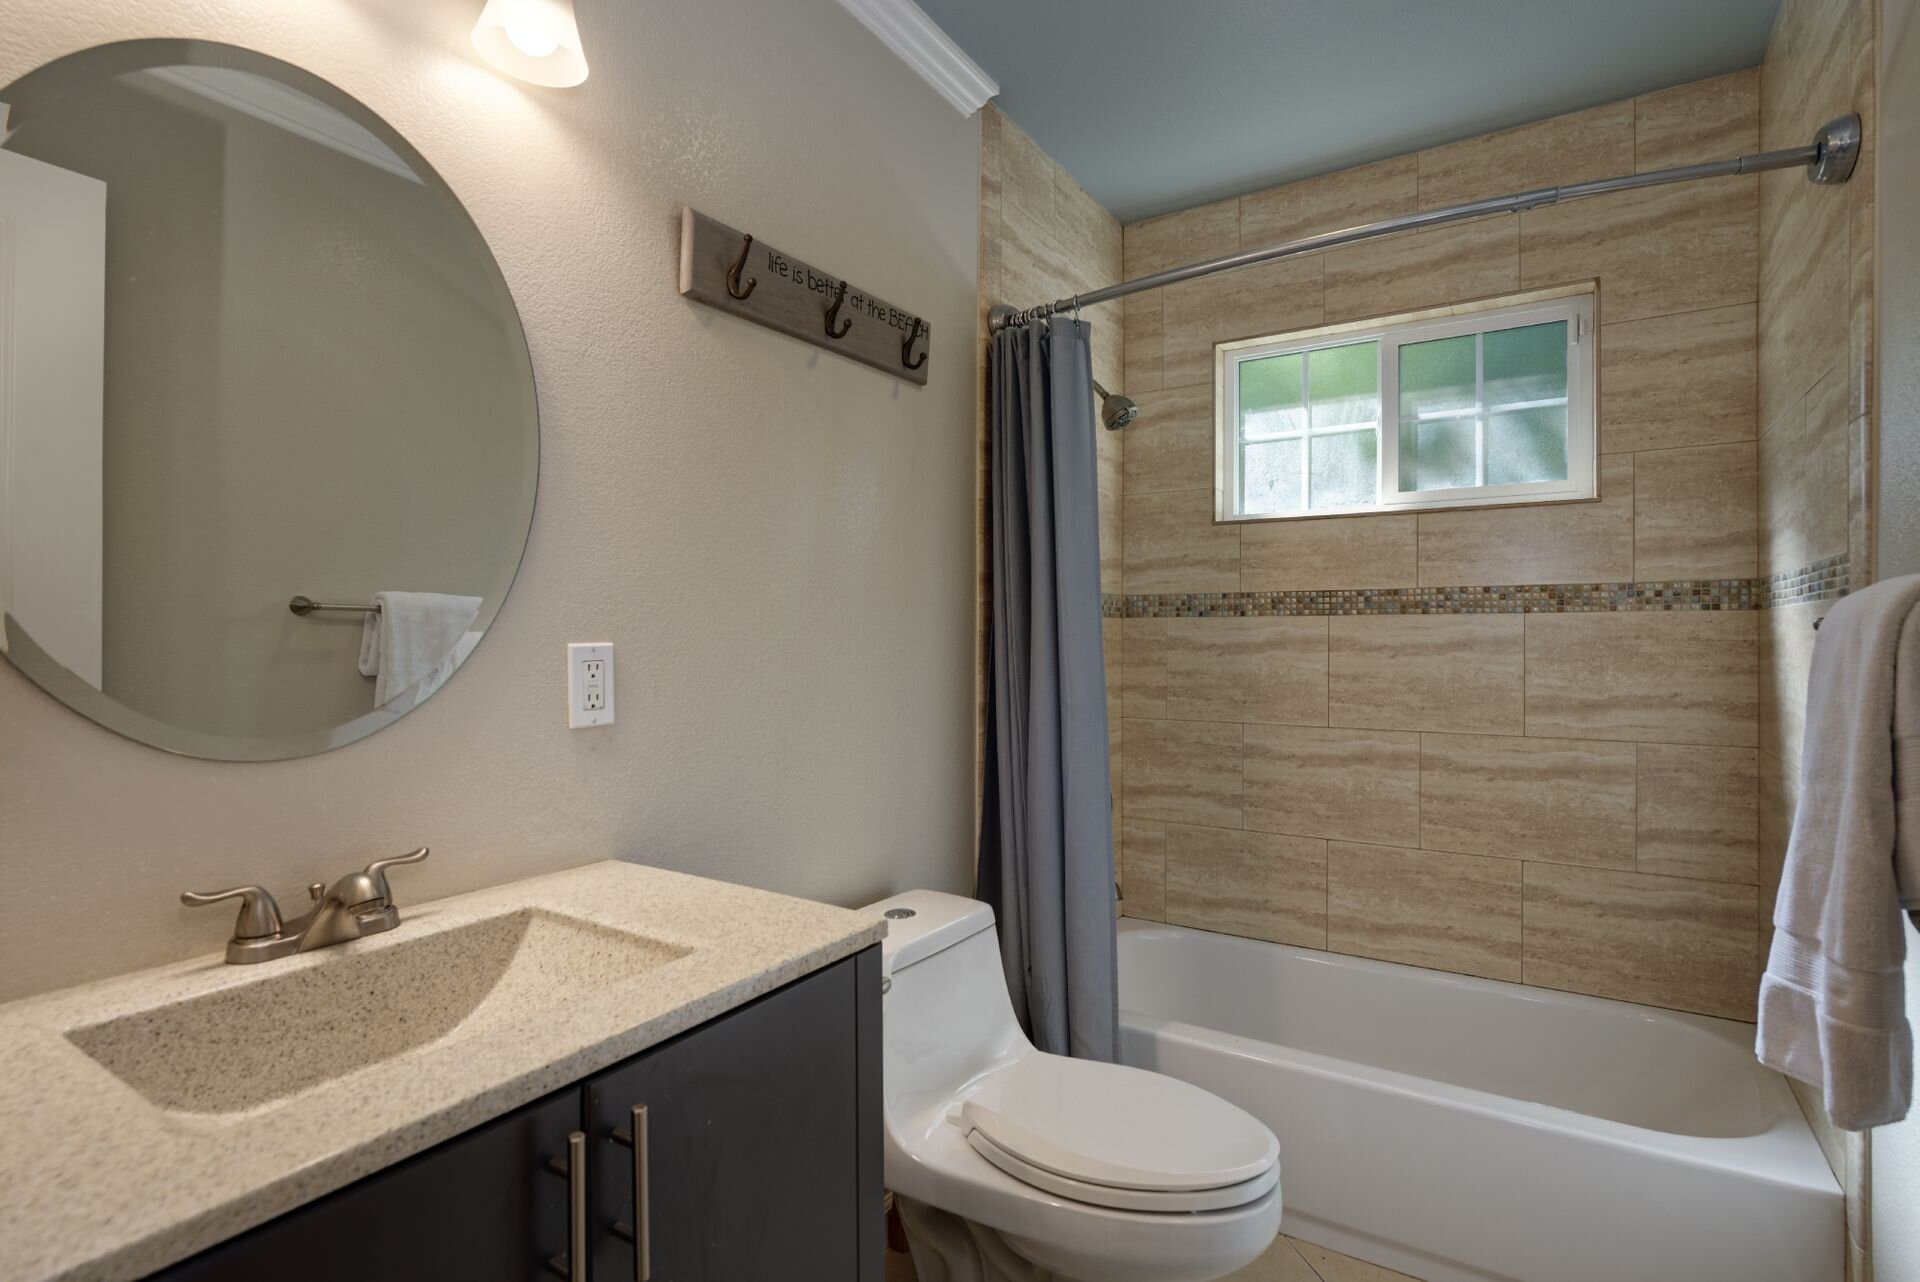 16_Bathroom.jpg